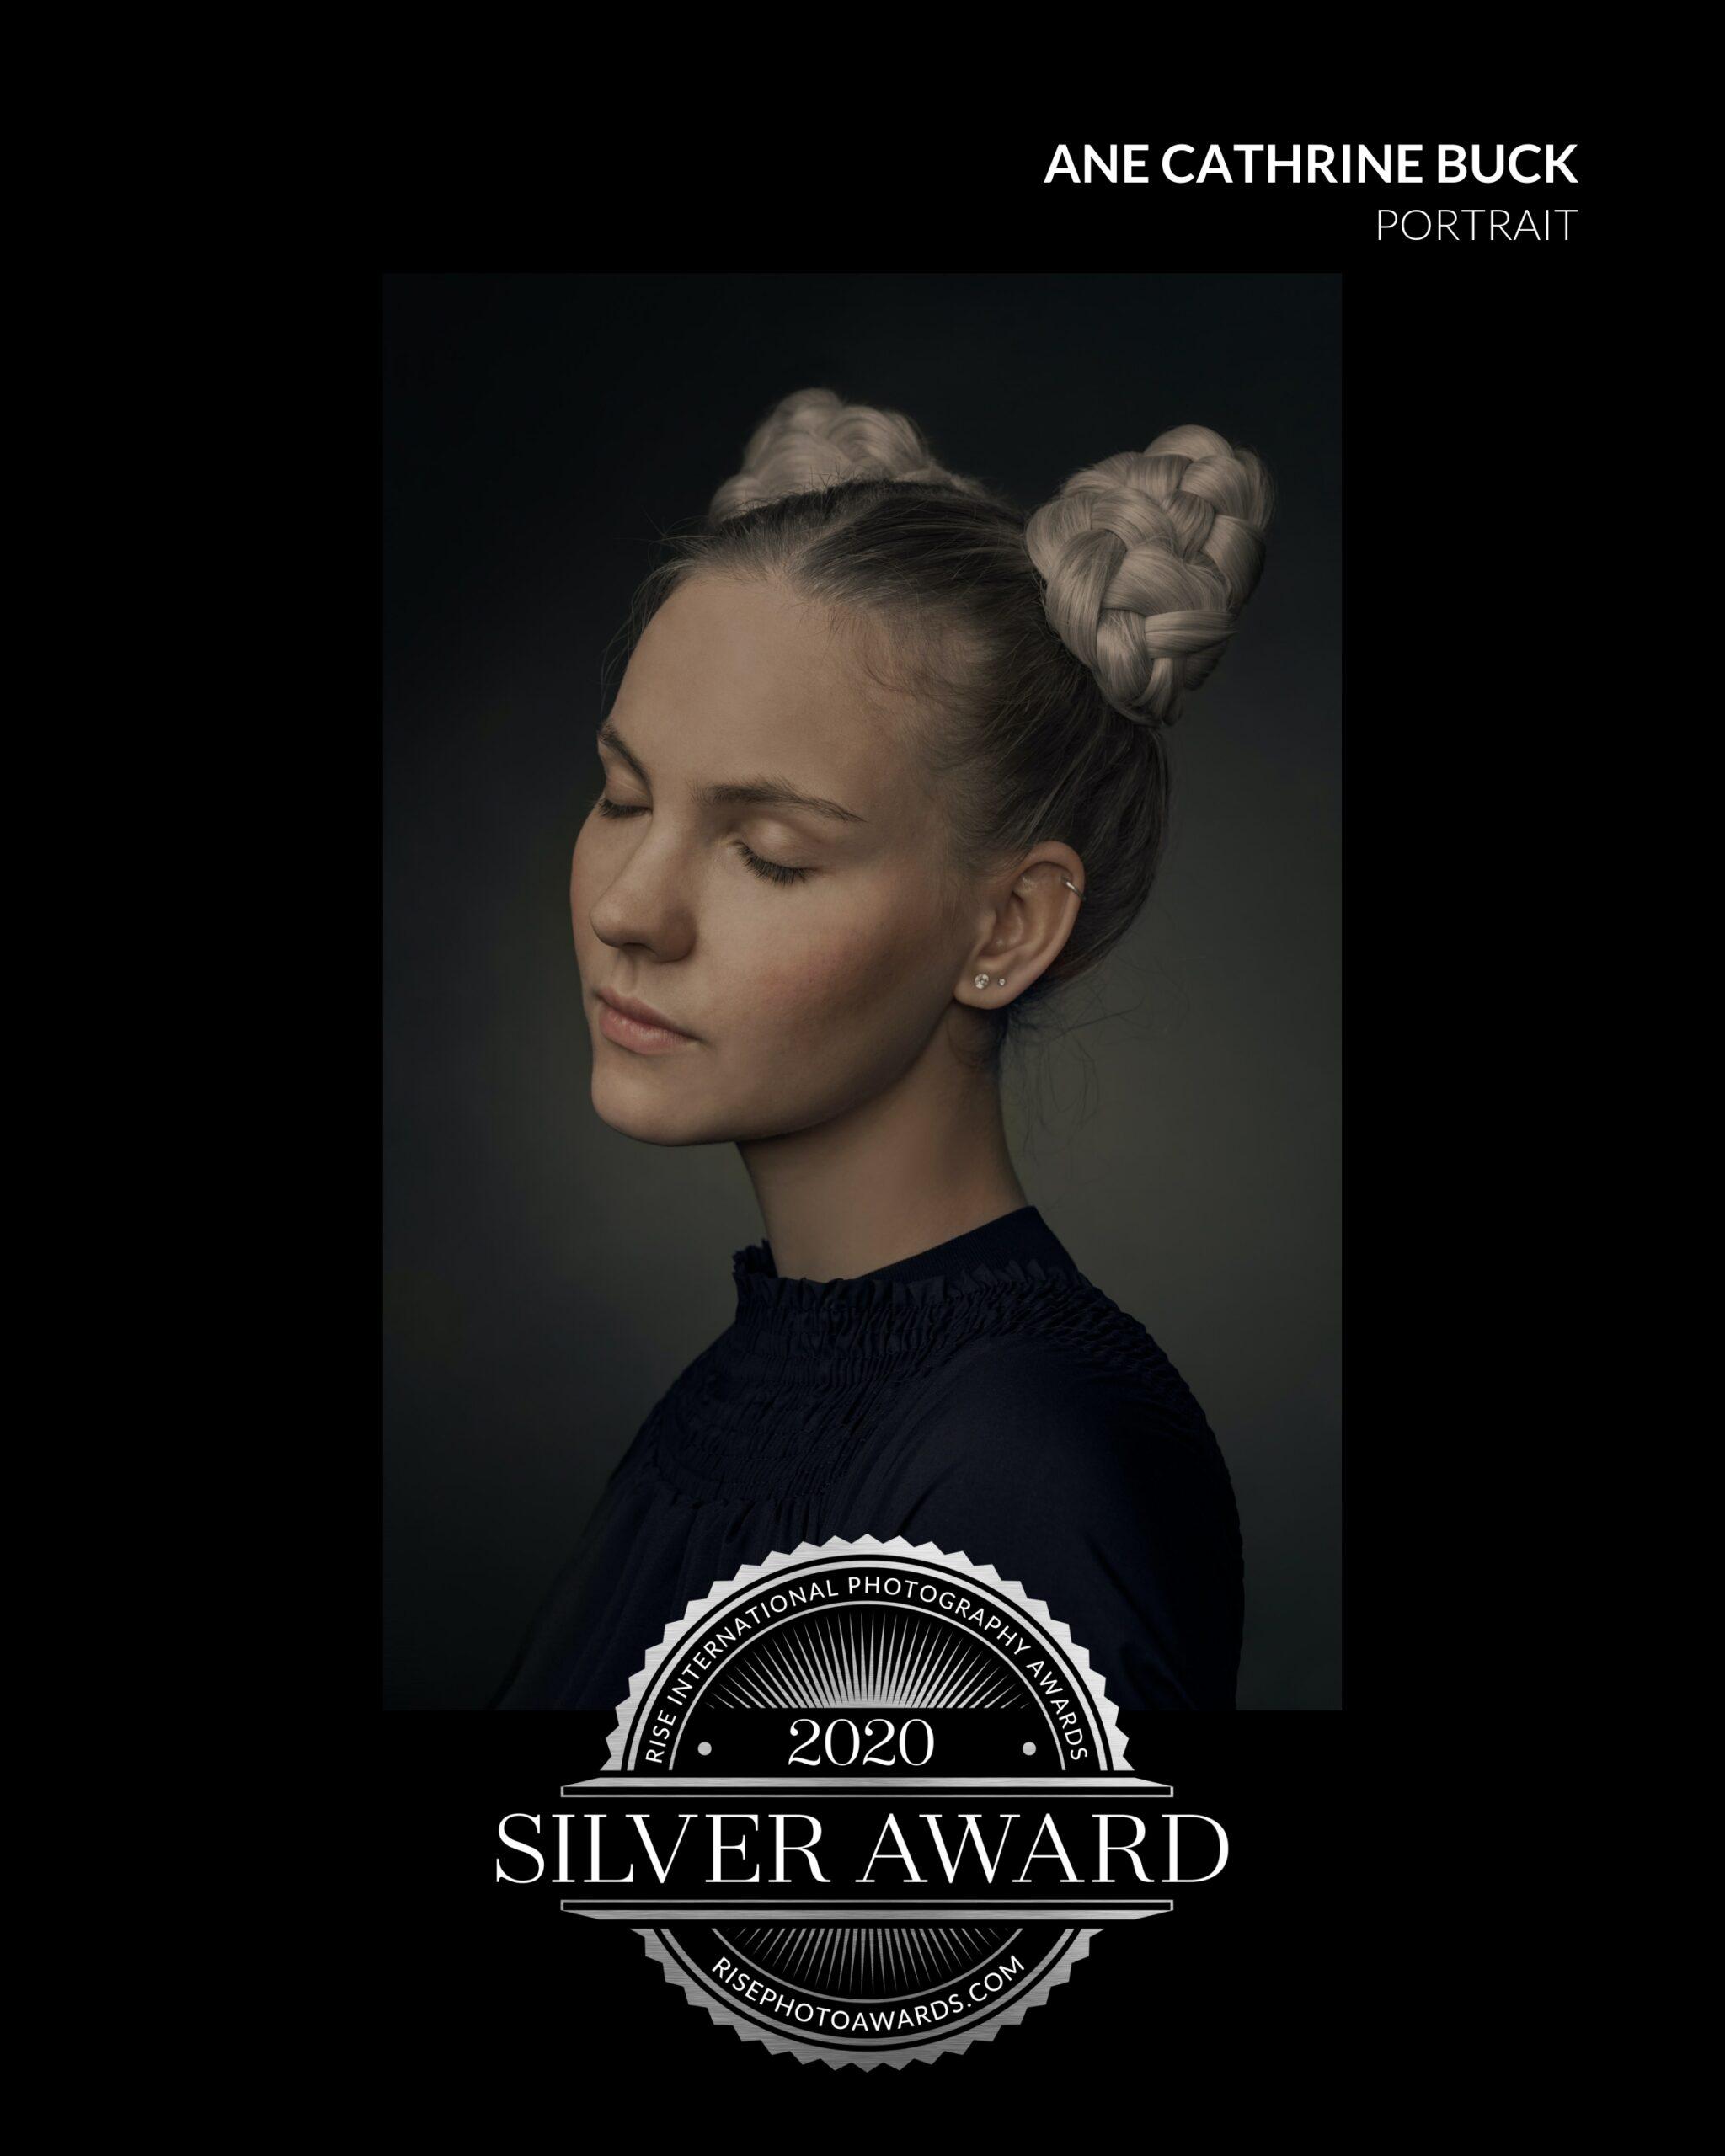 Linea sølv medalje rise international photography awards